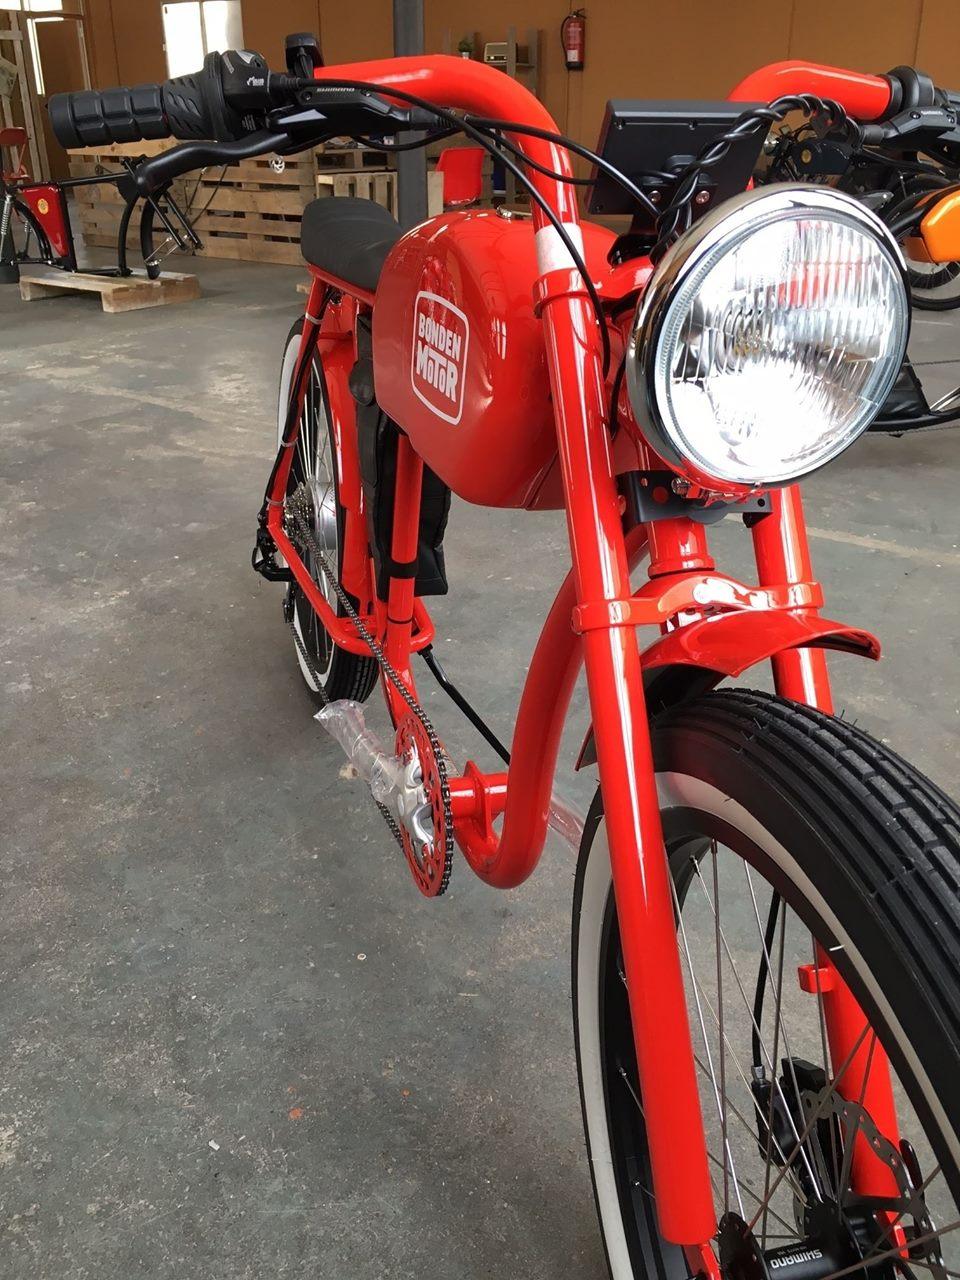 www.Dezigno.be_Otocycle_Otocycles_Vintageelectricbike_Ebike_Elektrische_fiets_Speed_Pedelec_Cruiser_Cruisen_Shimano_RAL_Design_250W_500W_Caferacer_Caféracer_Café+Racer_Racer_304 kopie.jpg